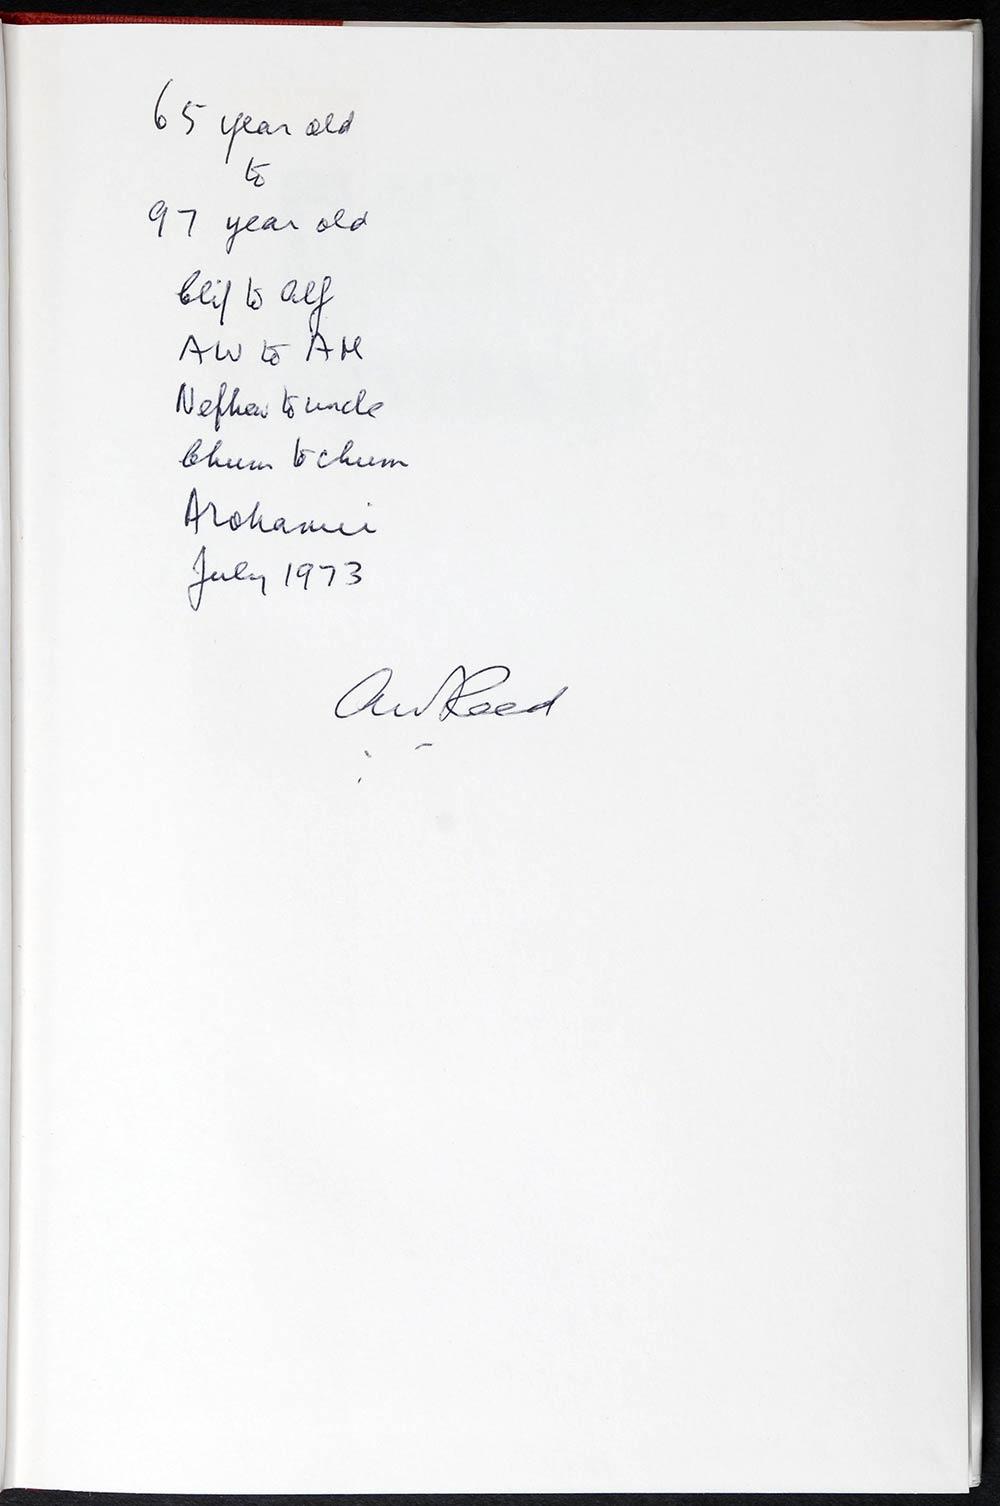 A.W. Reed. <em>Place names of Australia</em>. Sydney: Reed, 1973.